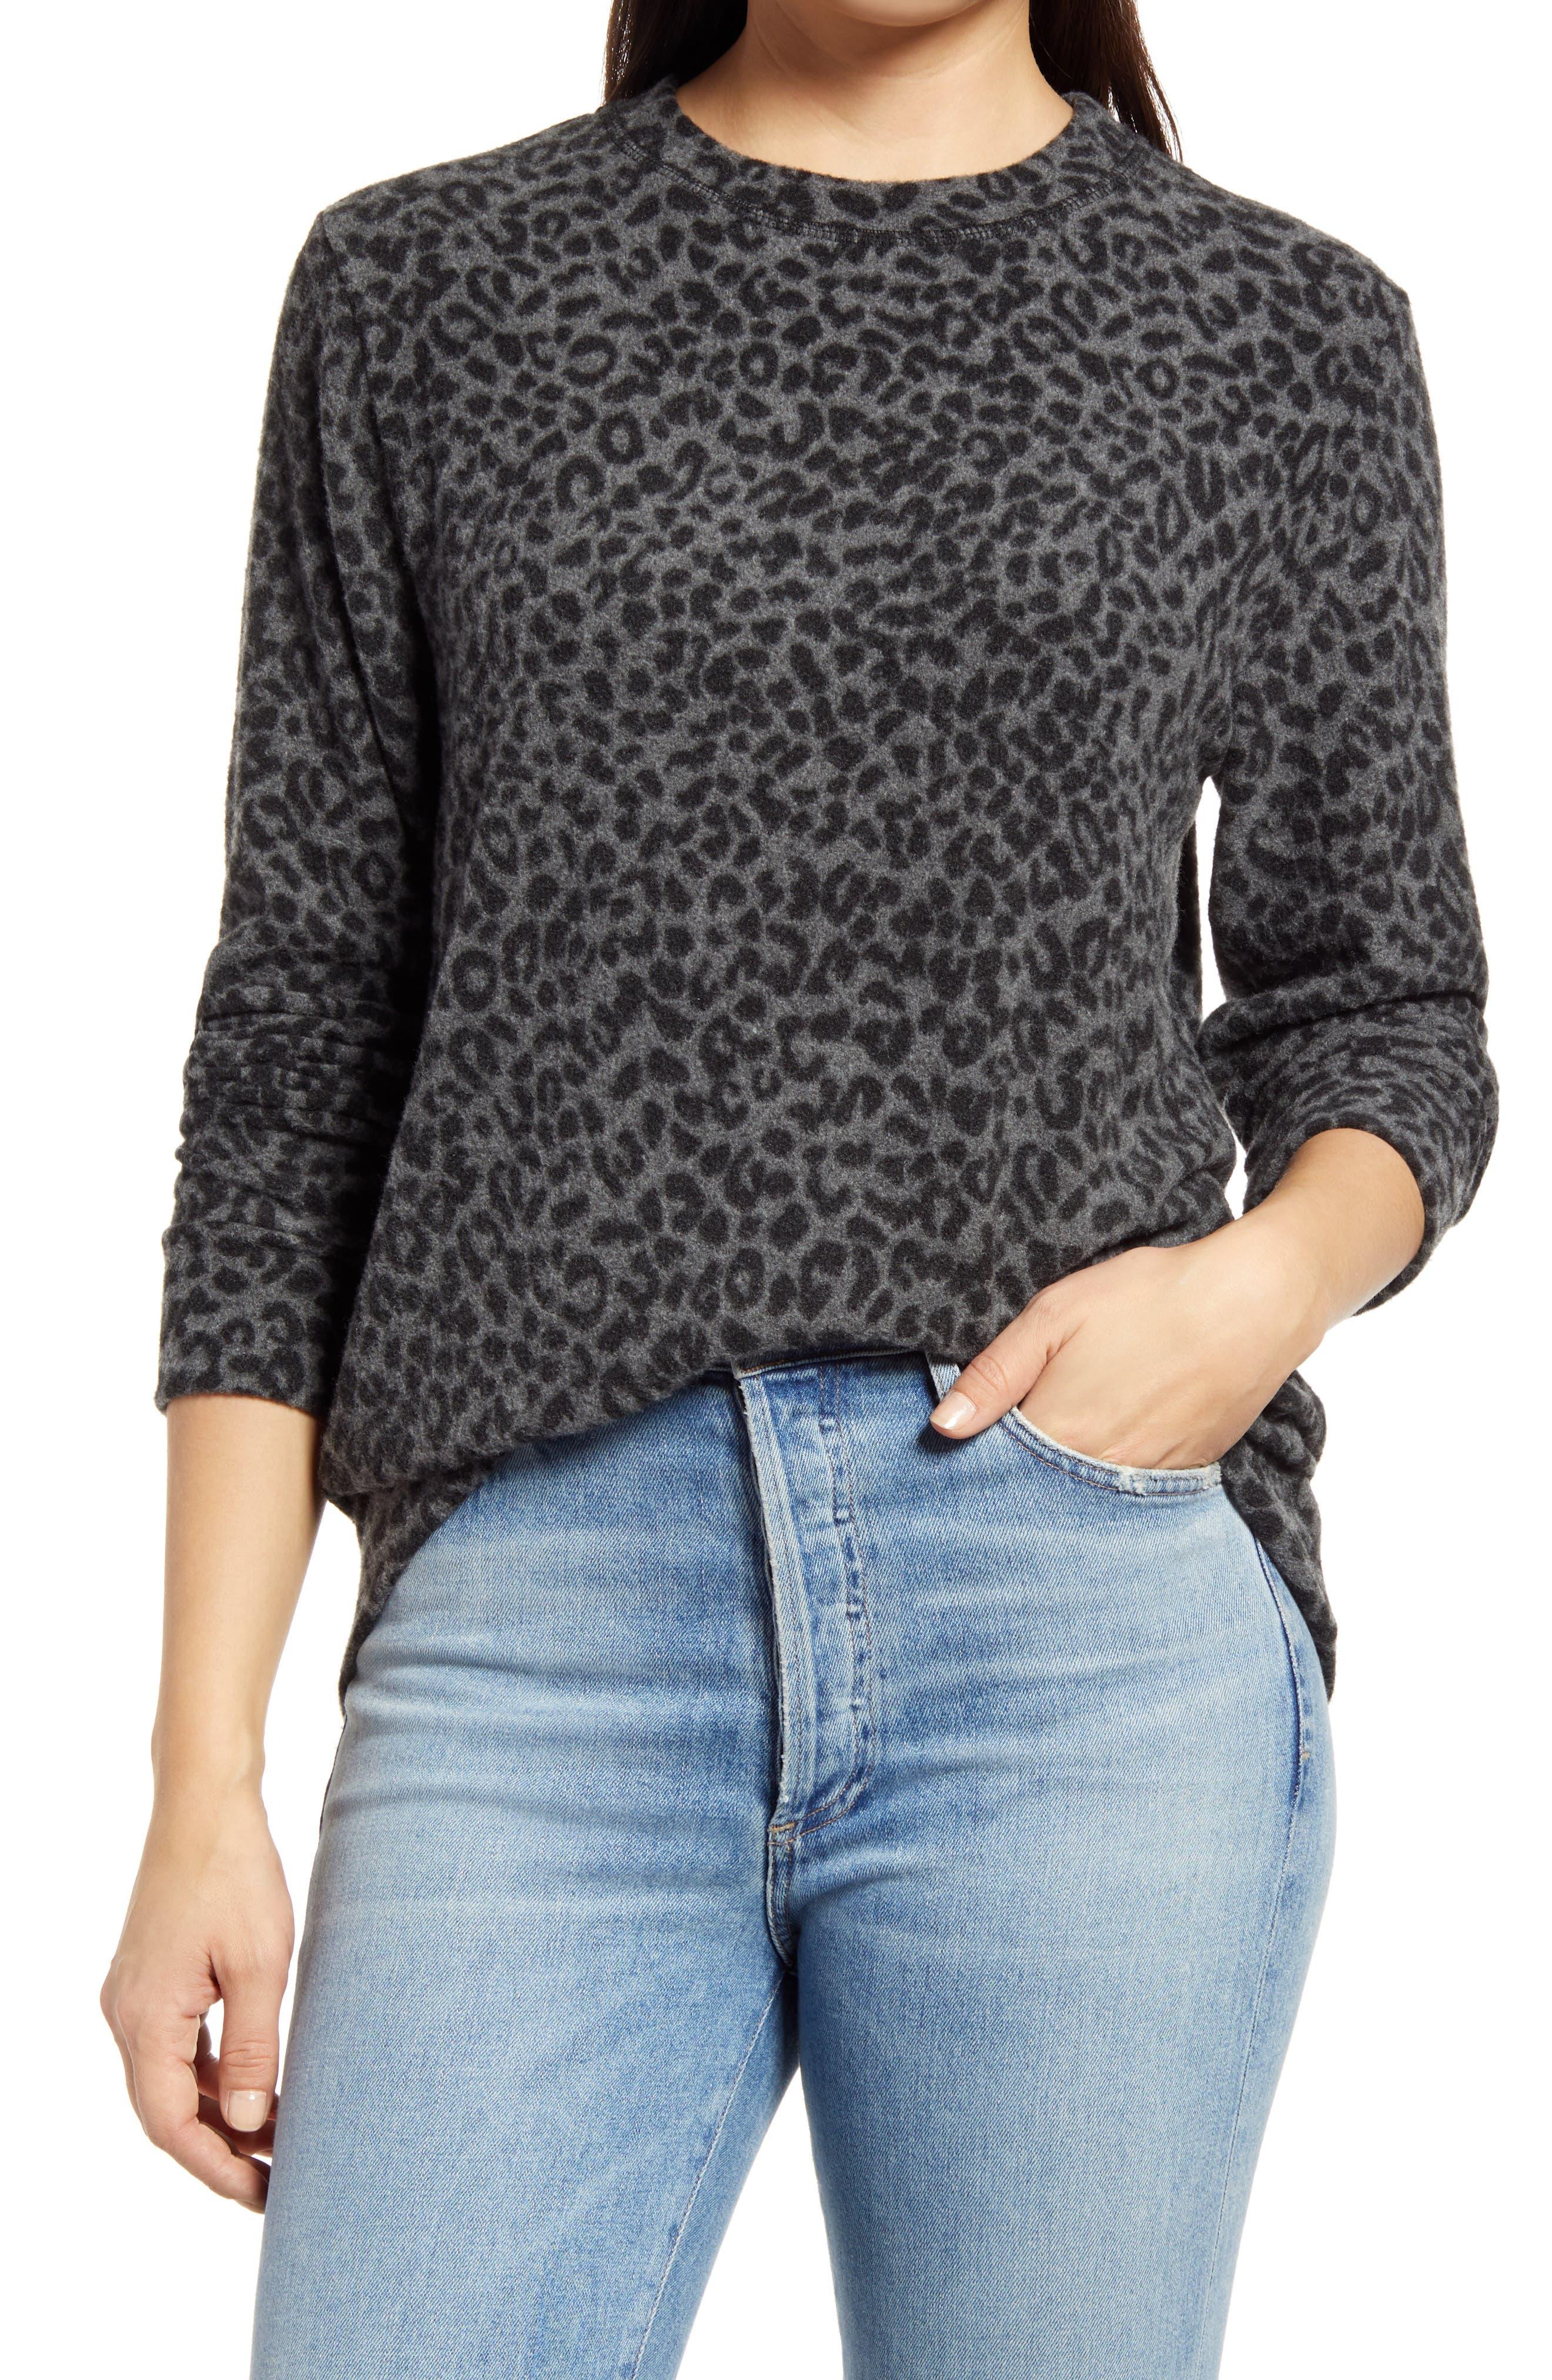 Women's Loveapella Brushed Leopard Print Long Sleeve Crewneck Top